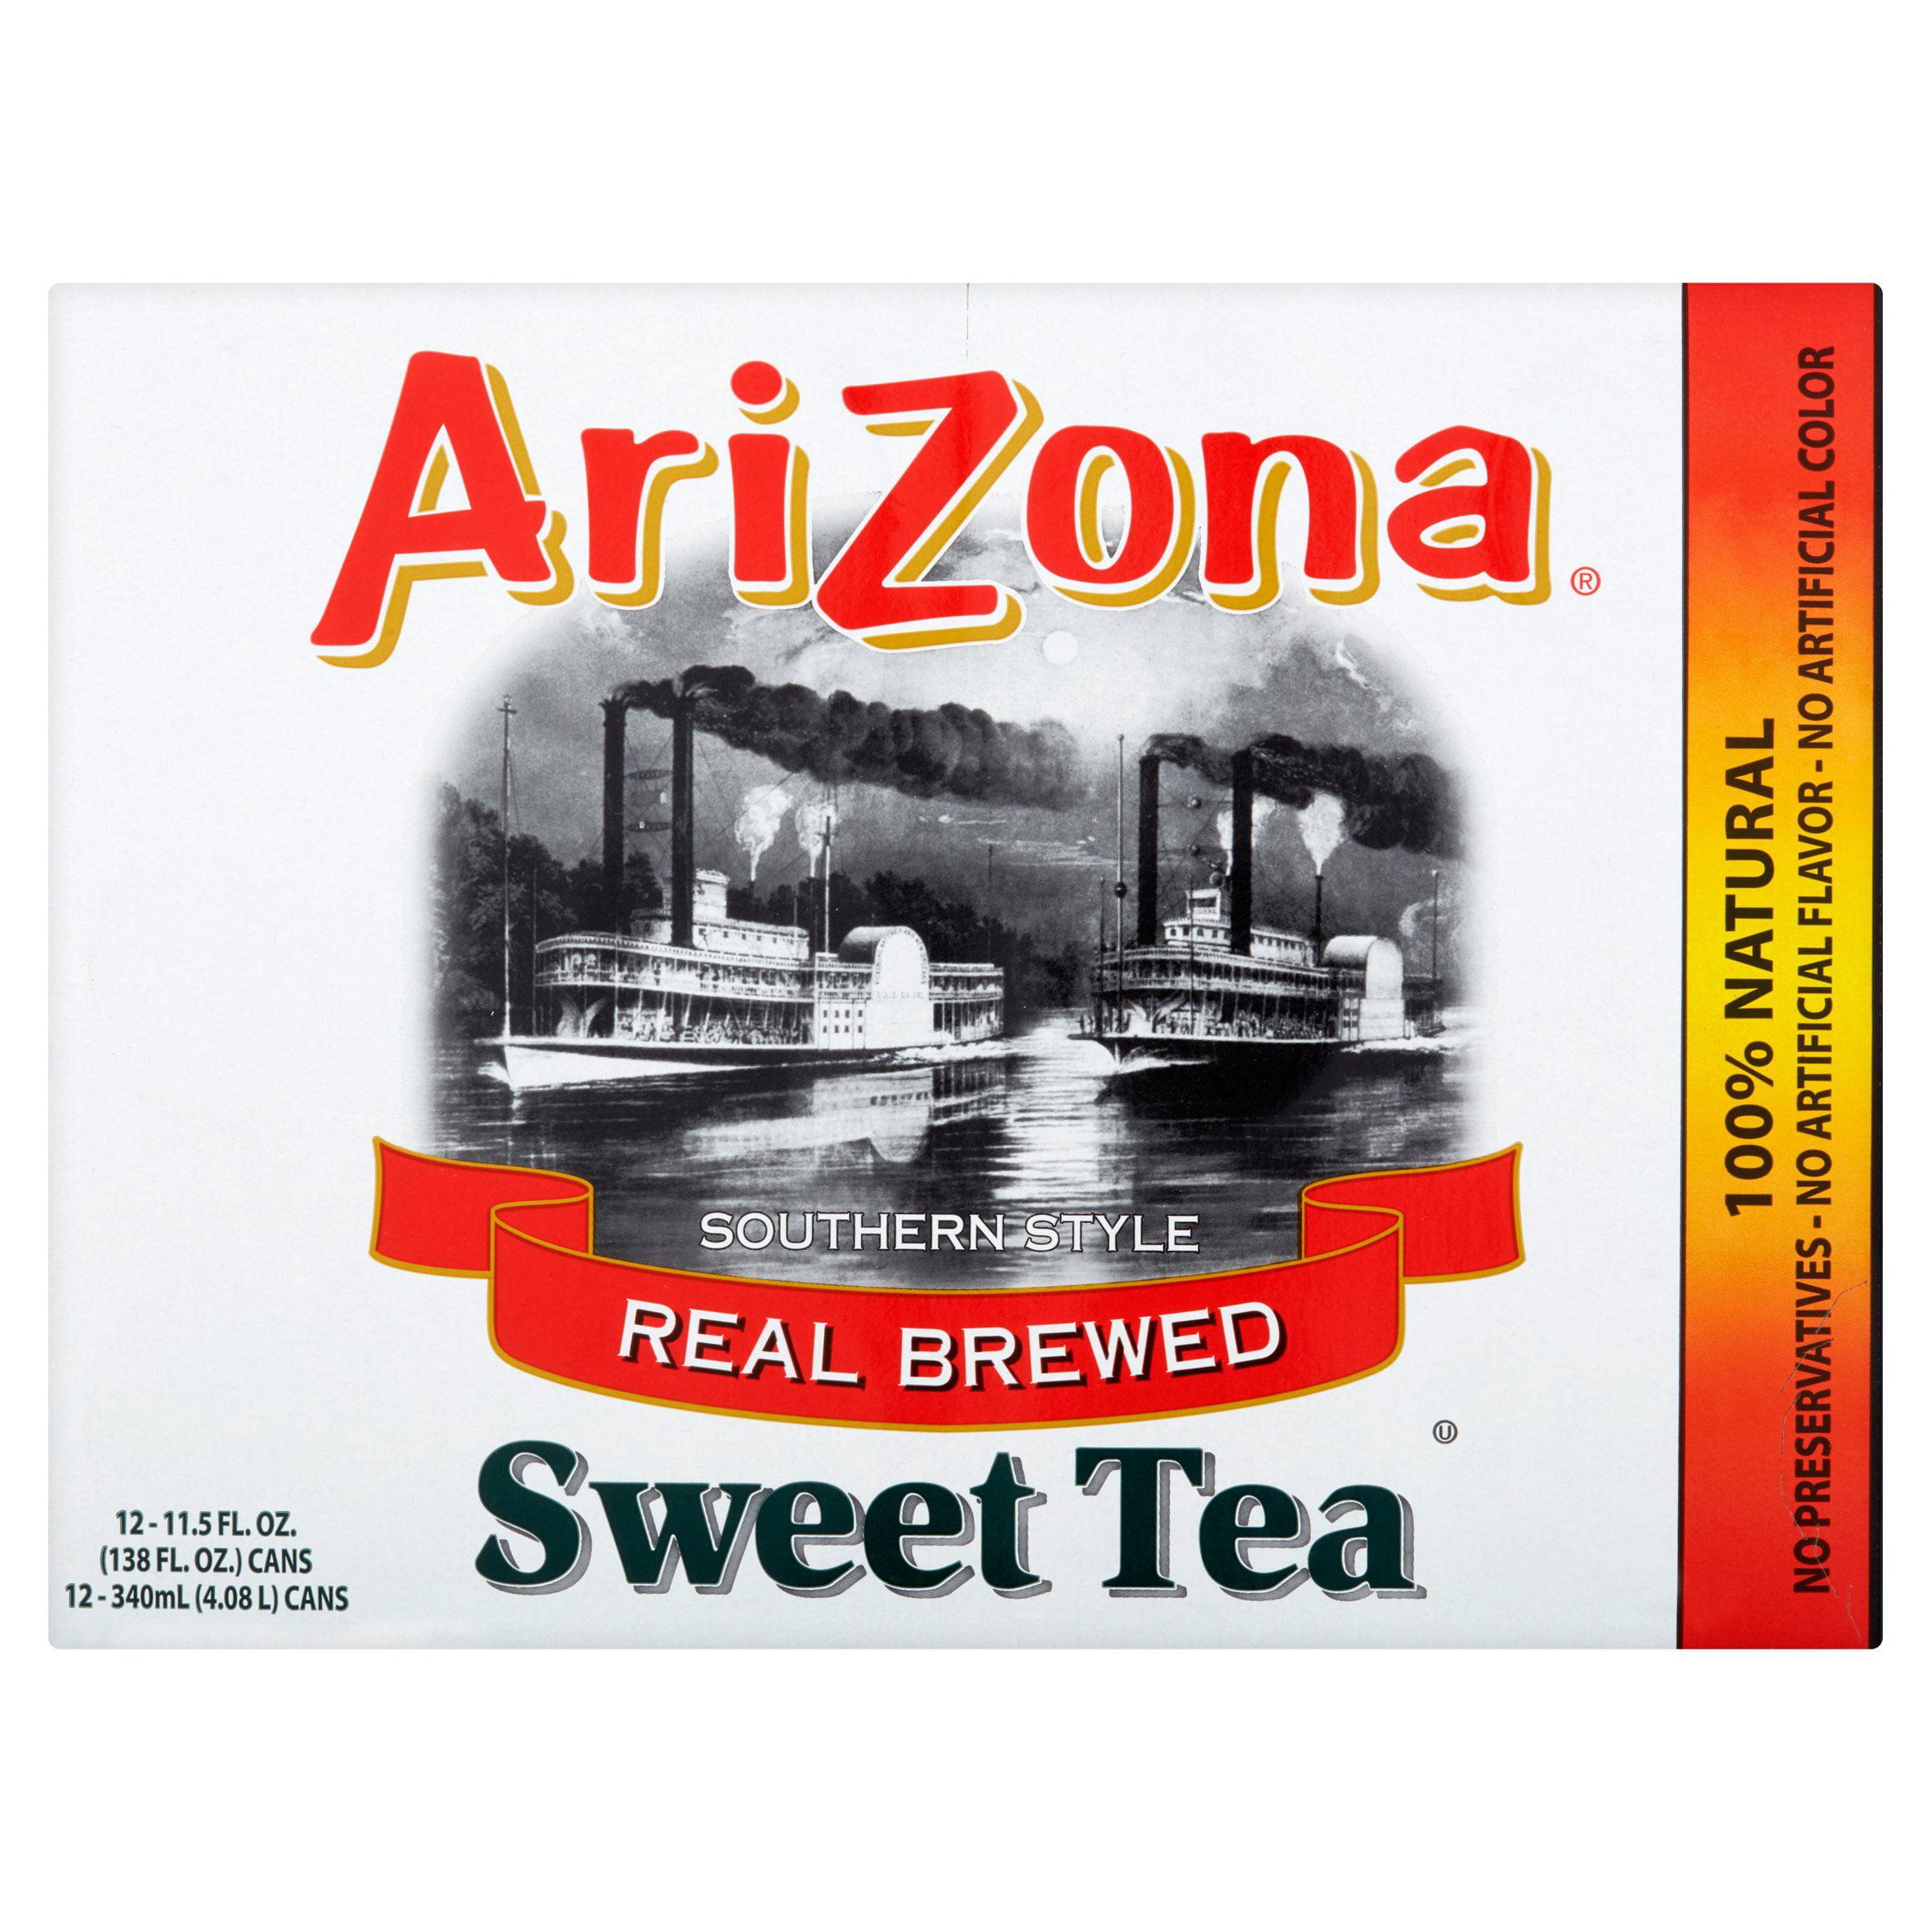 AriZona Real Brewed Southern Style Sweet Tea, 11.5 FL OZ by Arizona Beverages USA LLC